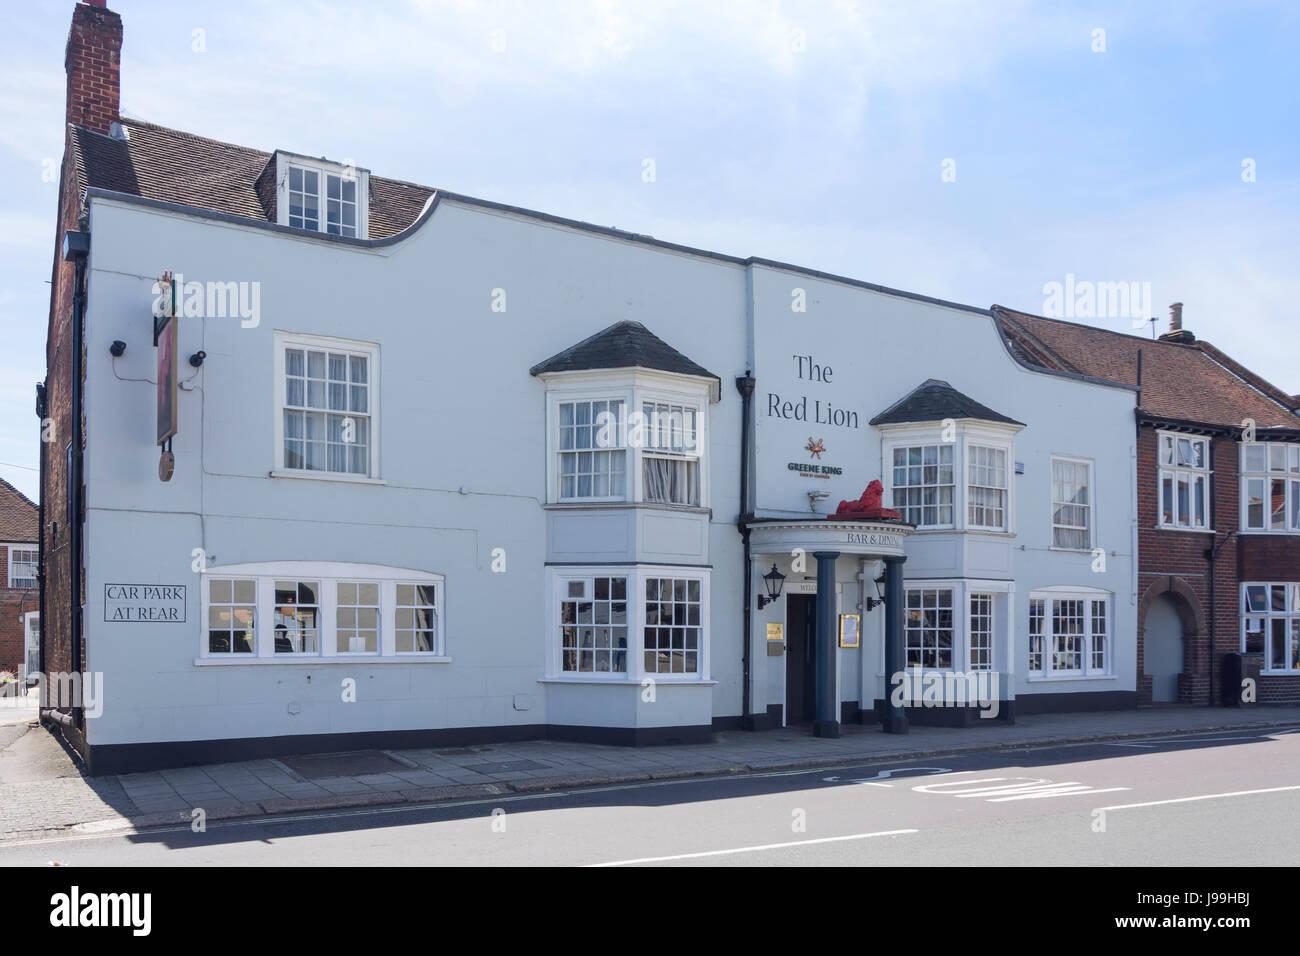 18th century The Red Lion Hotel, High Street, Fareham, Hampshire, England, United Kingdom - Stock Image